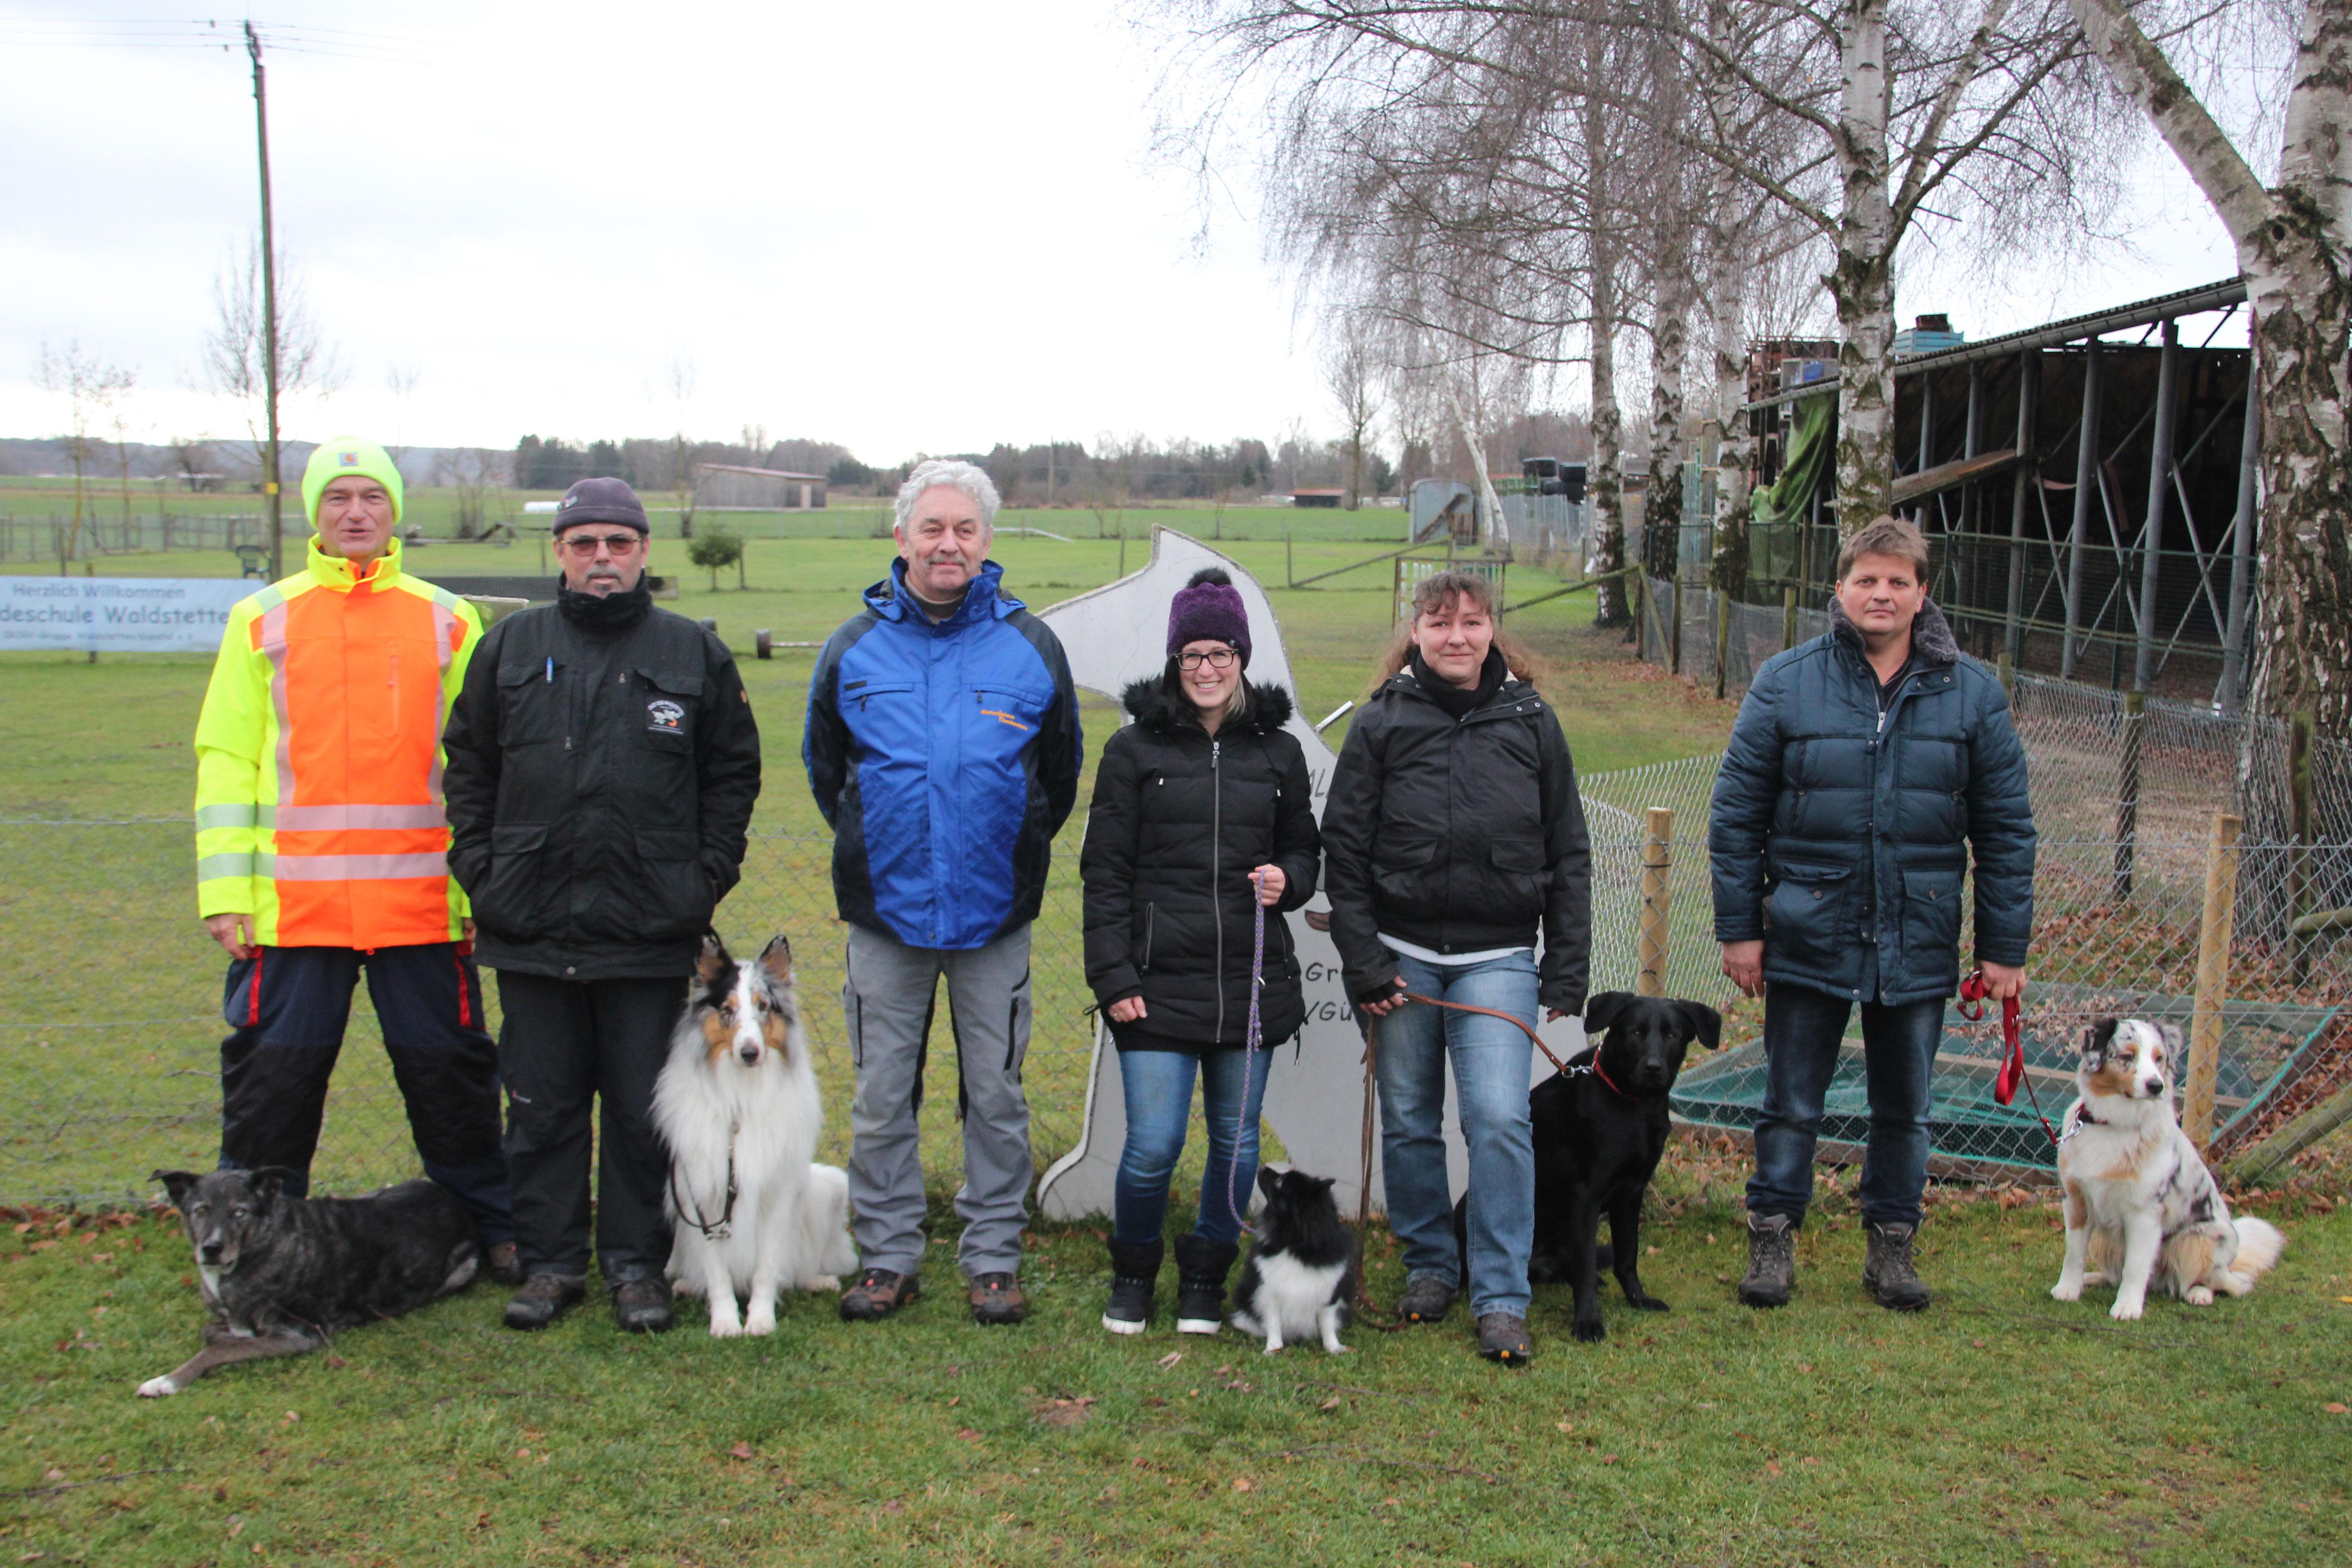 Begleithundeprüfung Hundeschule Waldstetten Kreis Günzburg